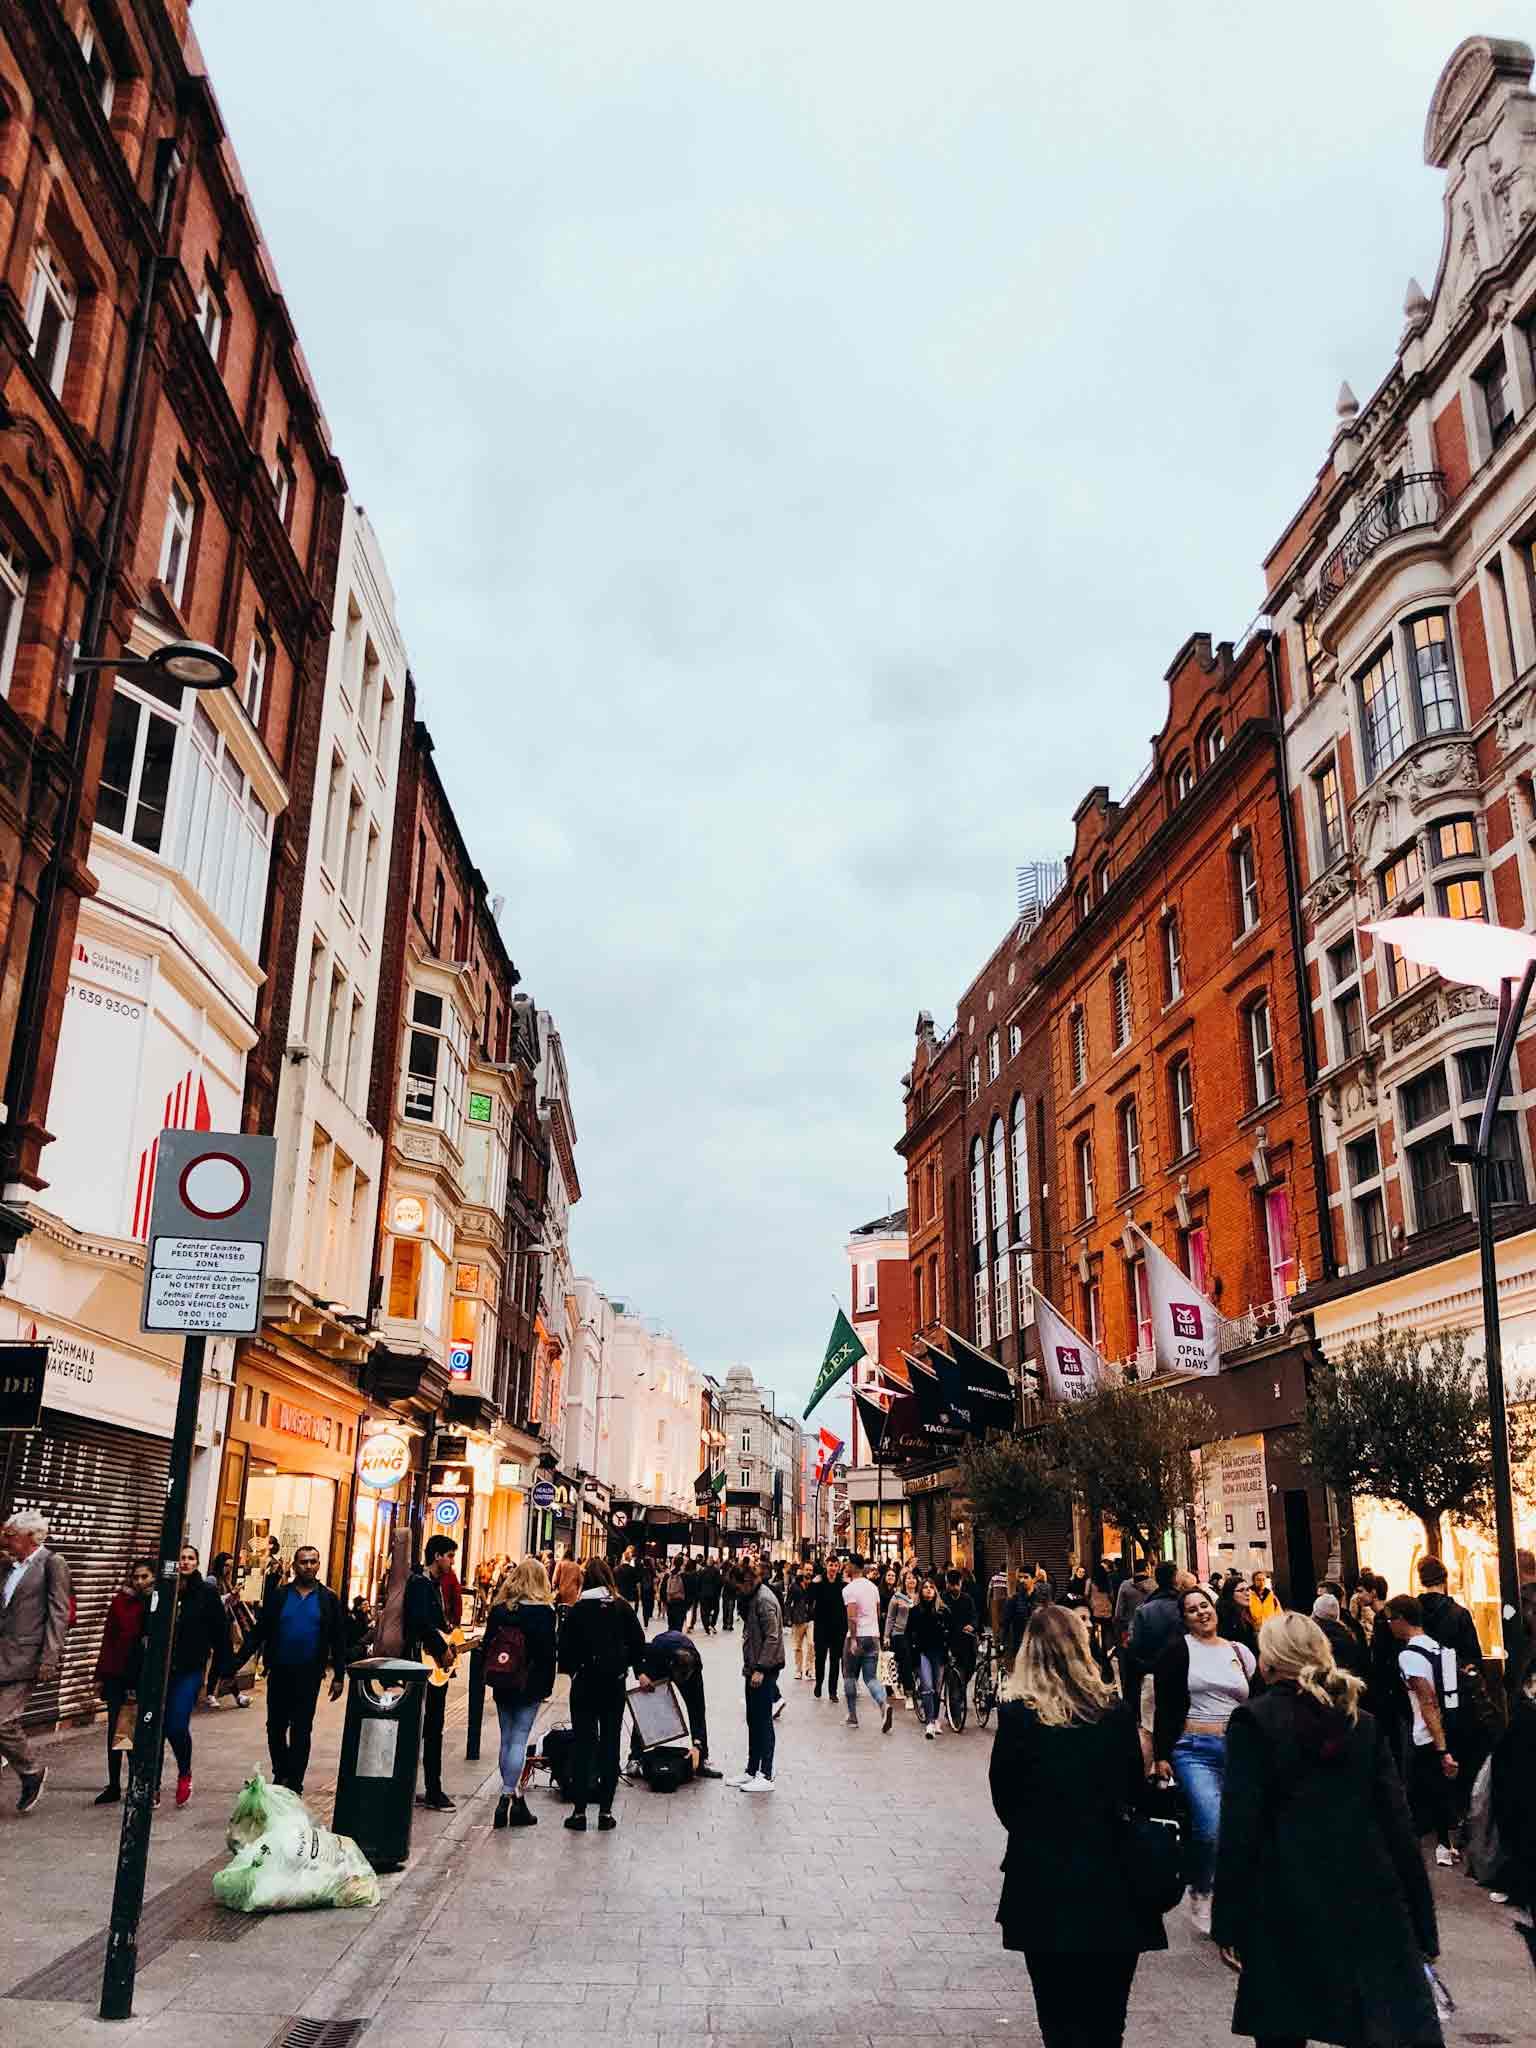 Dublin Ireland Dating Site, 100% Free Online Dating in Dublin